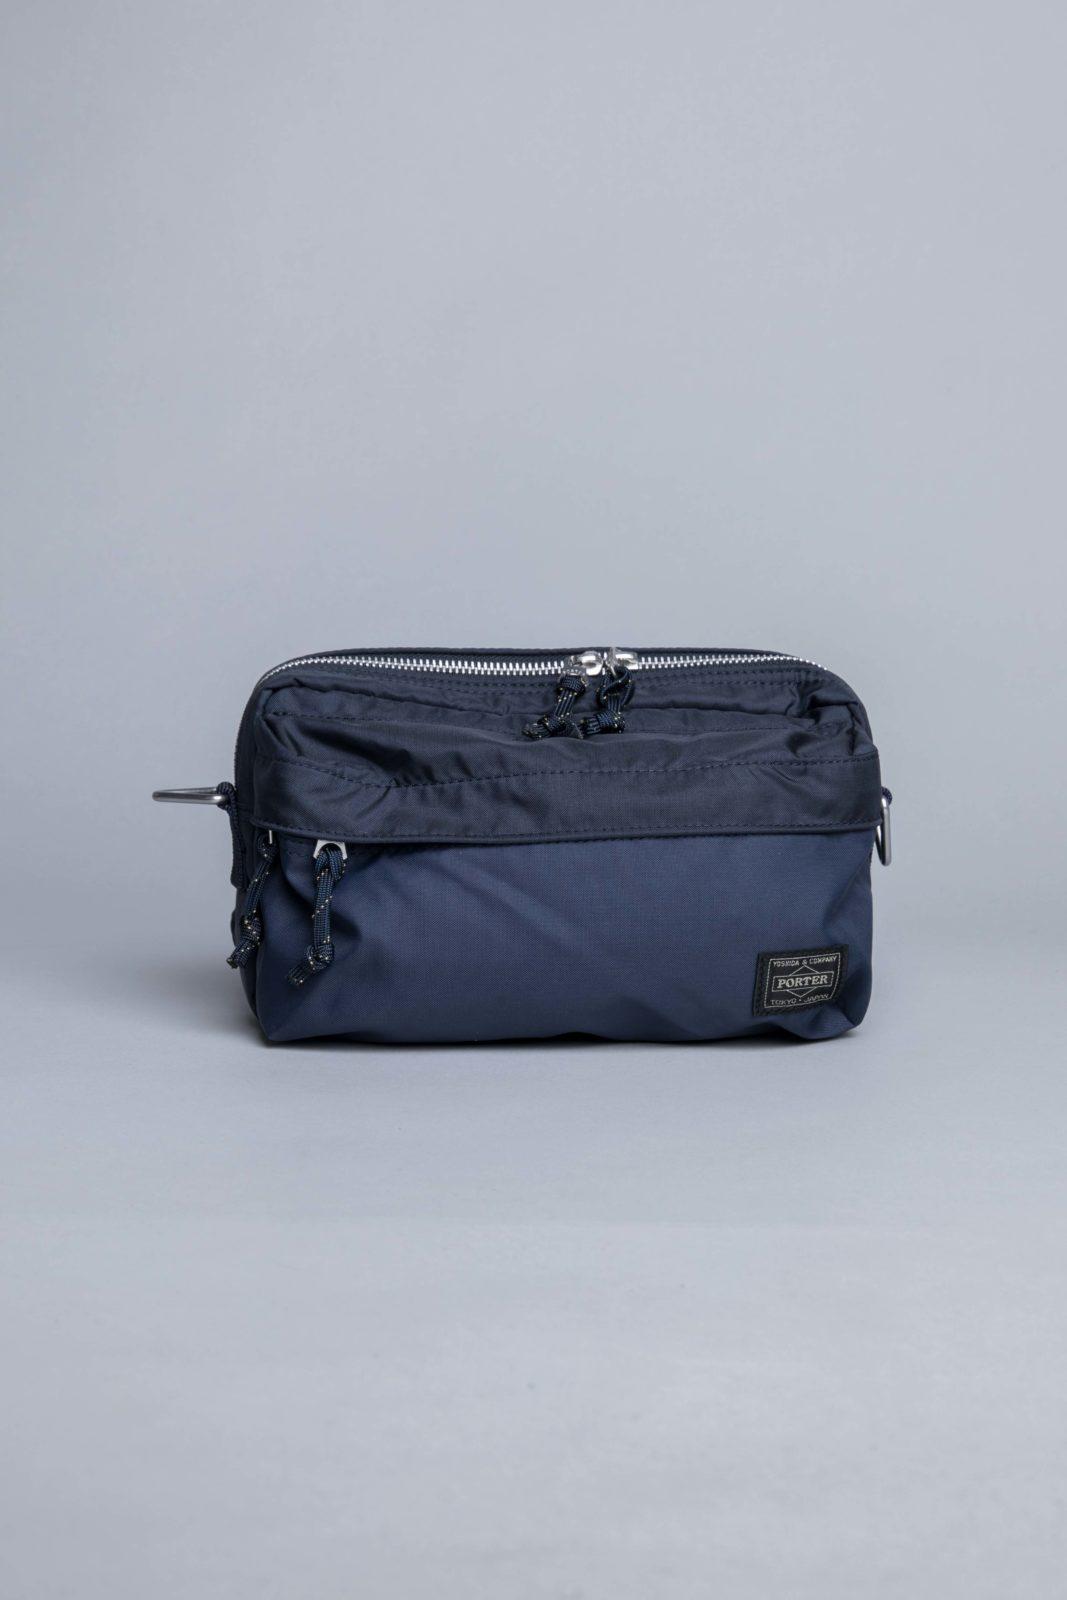 a90ff56b8ac5 Porter Yoshida 2way Waist Bag Navy • Centreville Store in Brussels